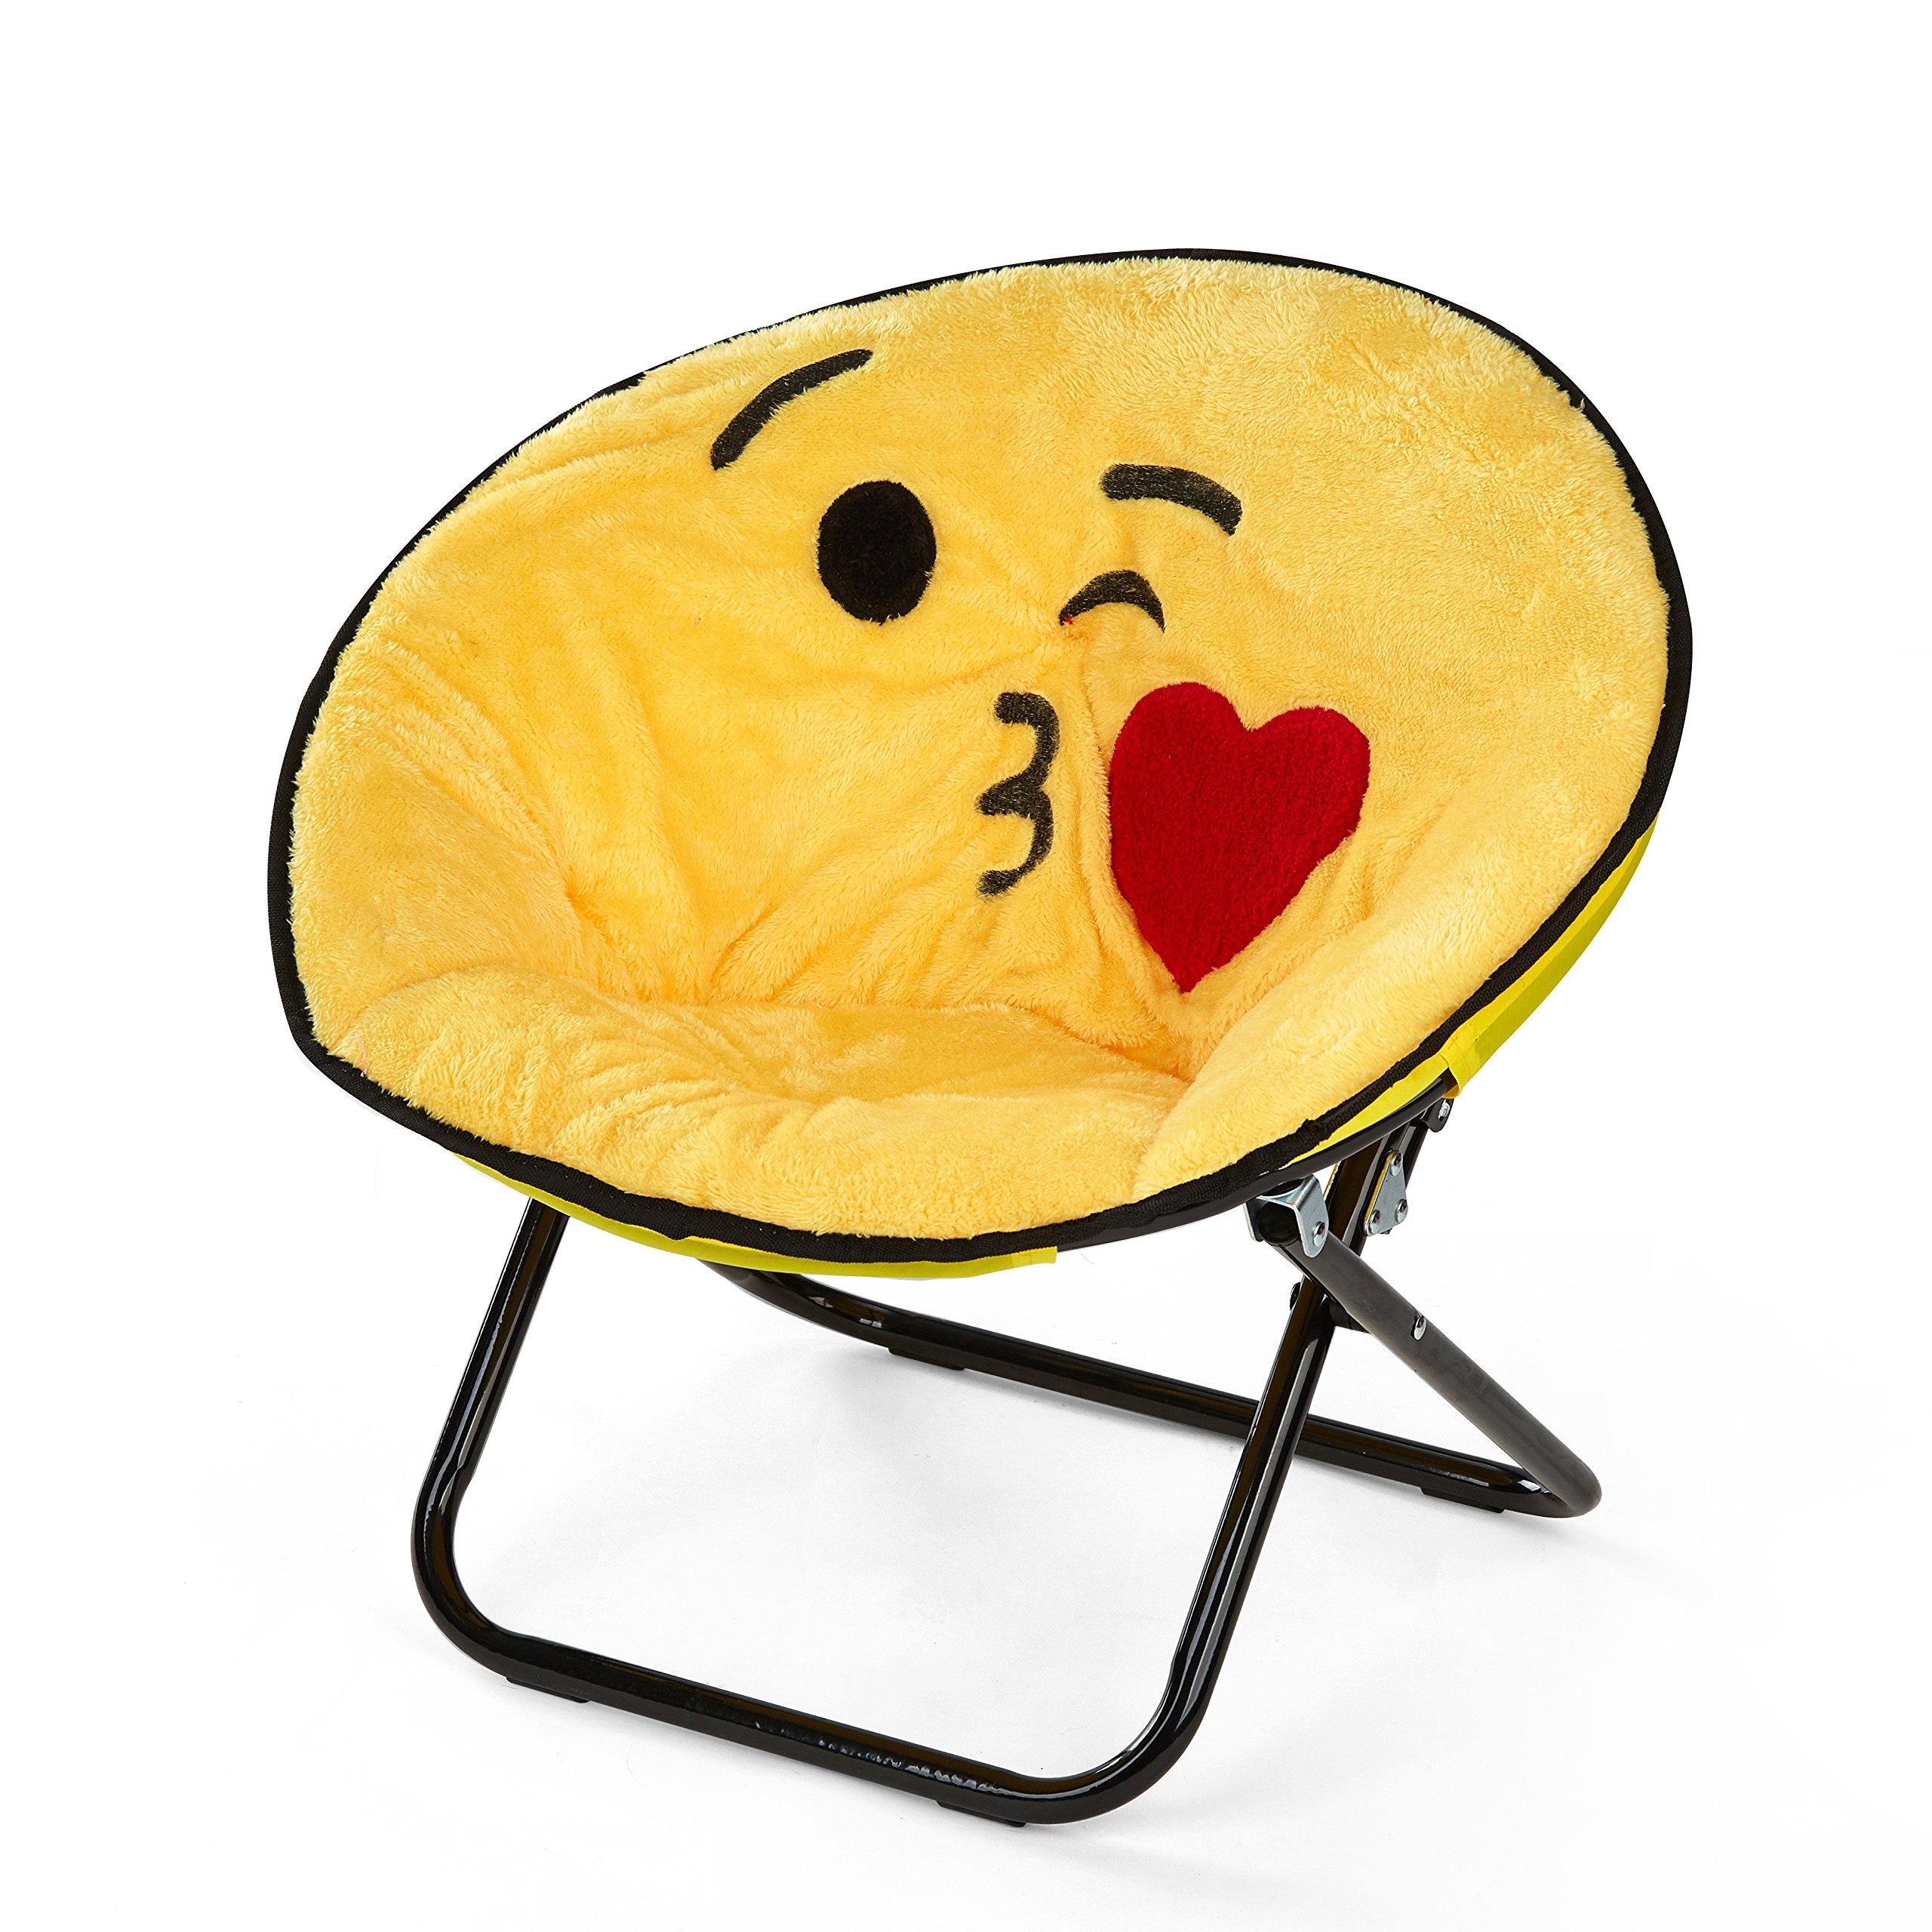 Emoji Pals NK656914 Kissy Kids Saucer Chair